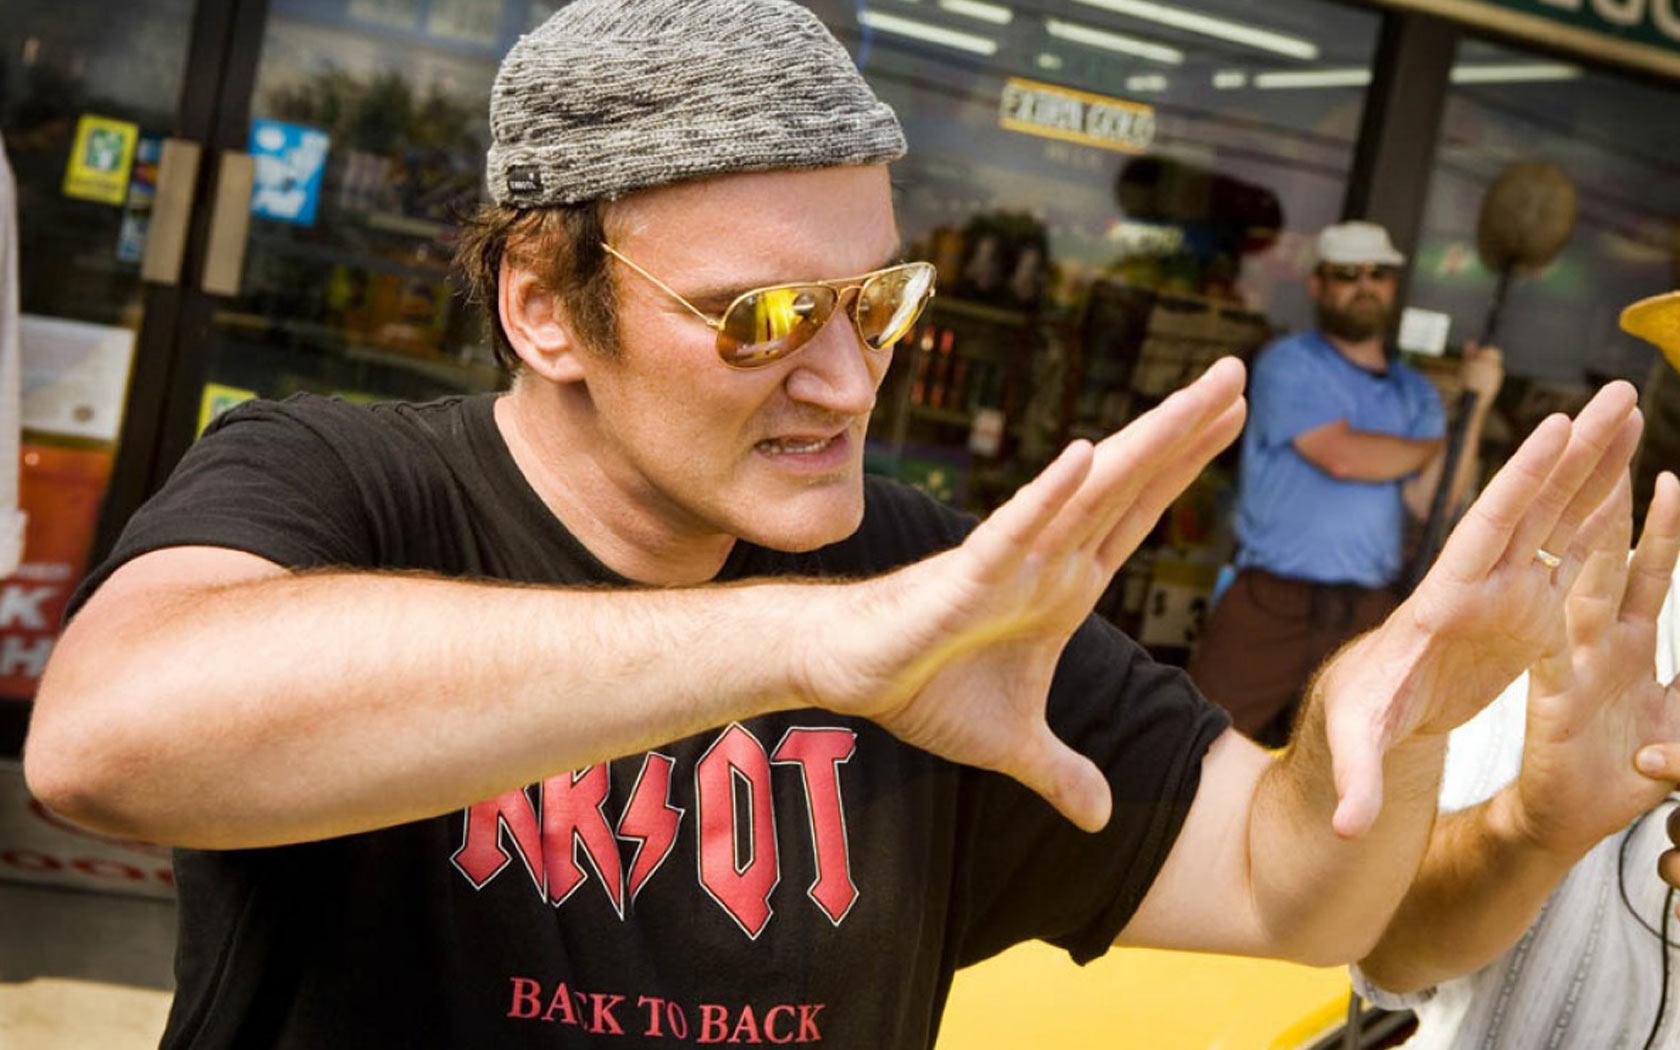 Quentin_Tarantino